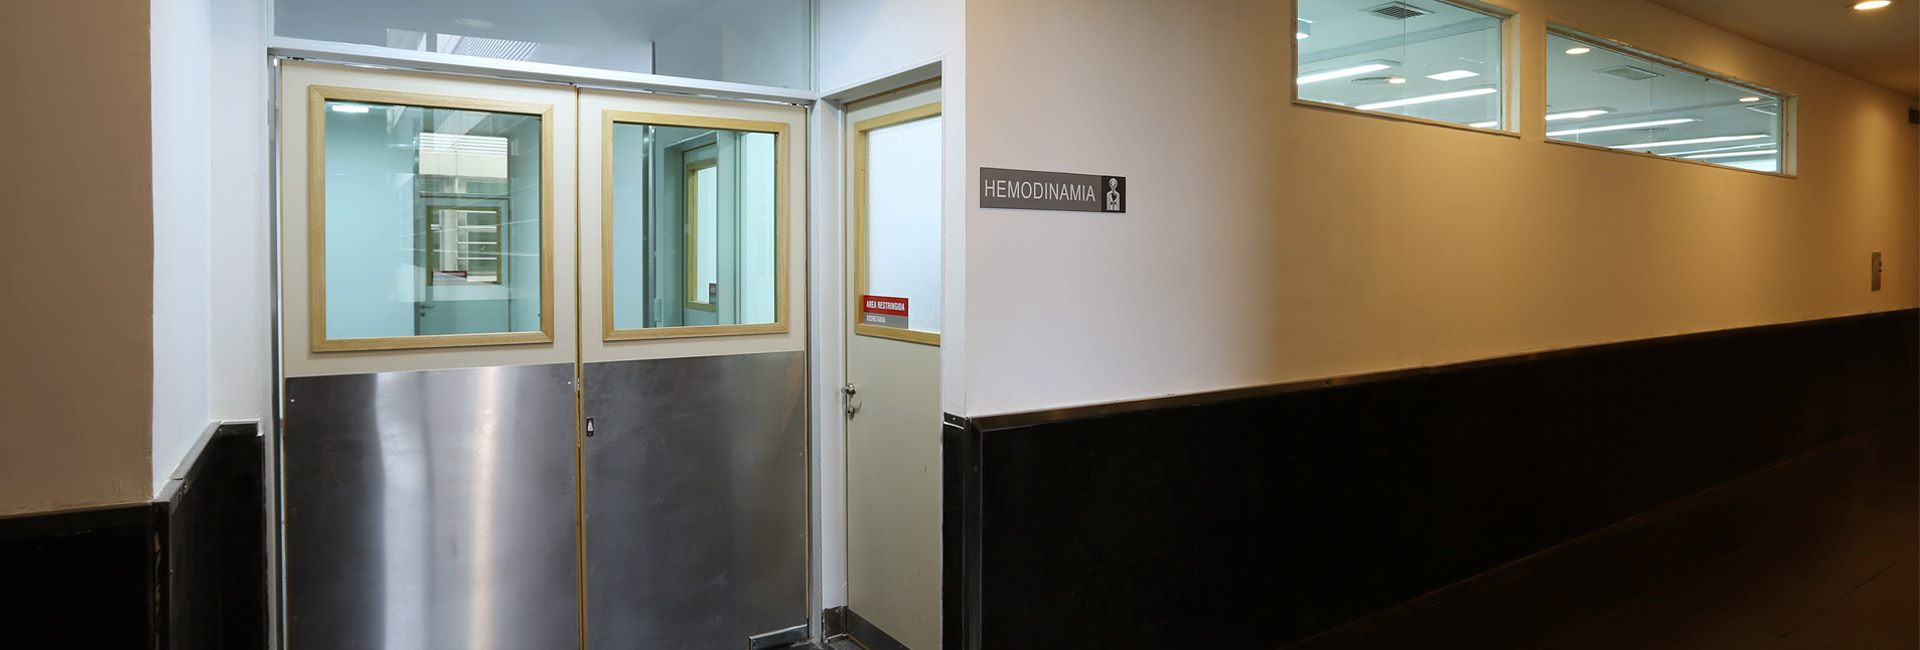 HECA - Ampliación Sala de Hemodinamia